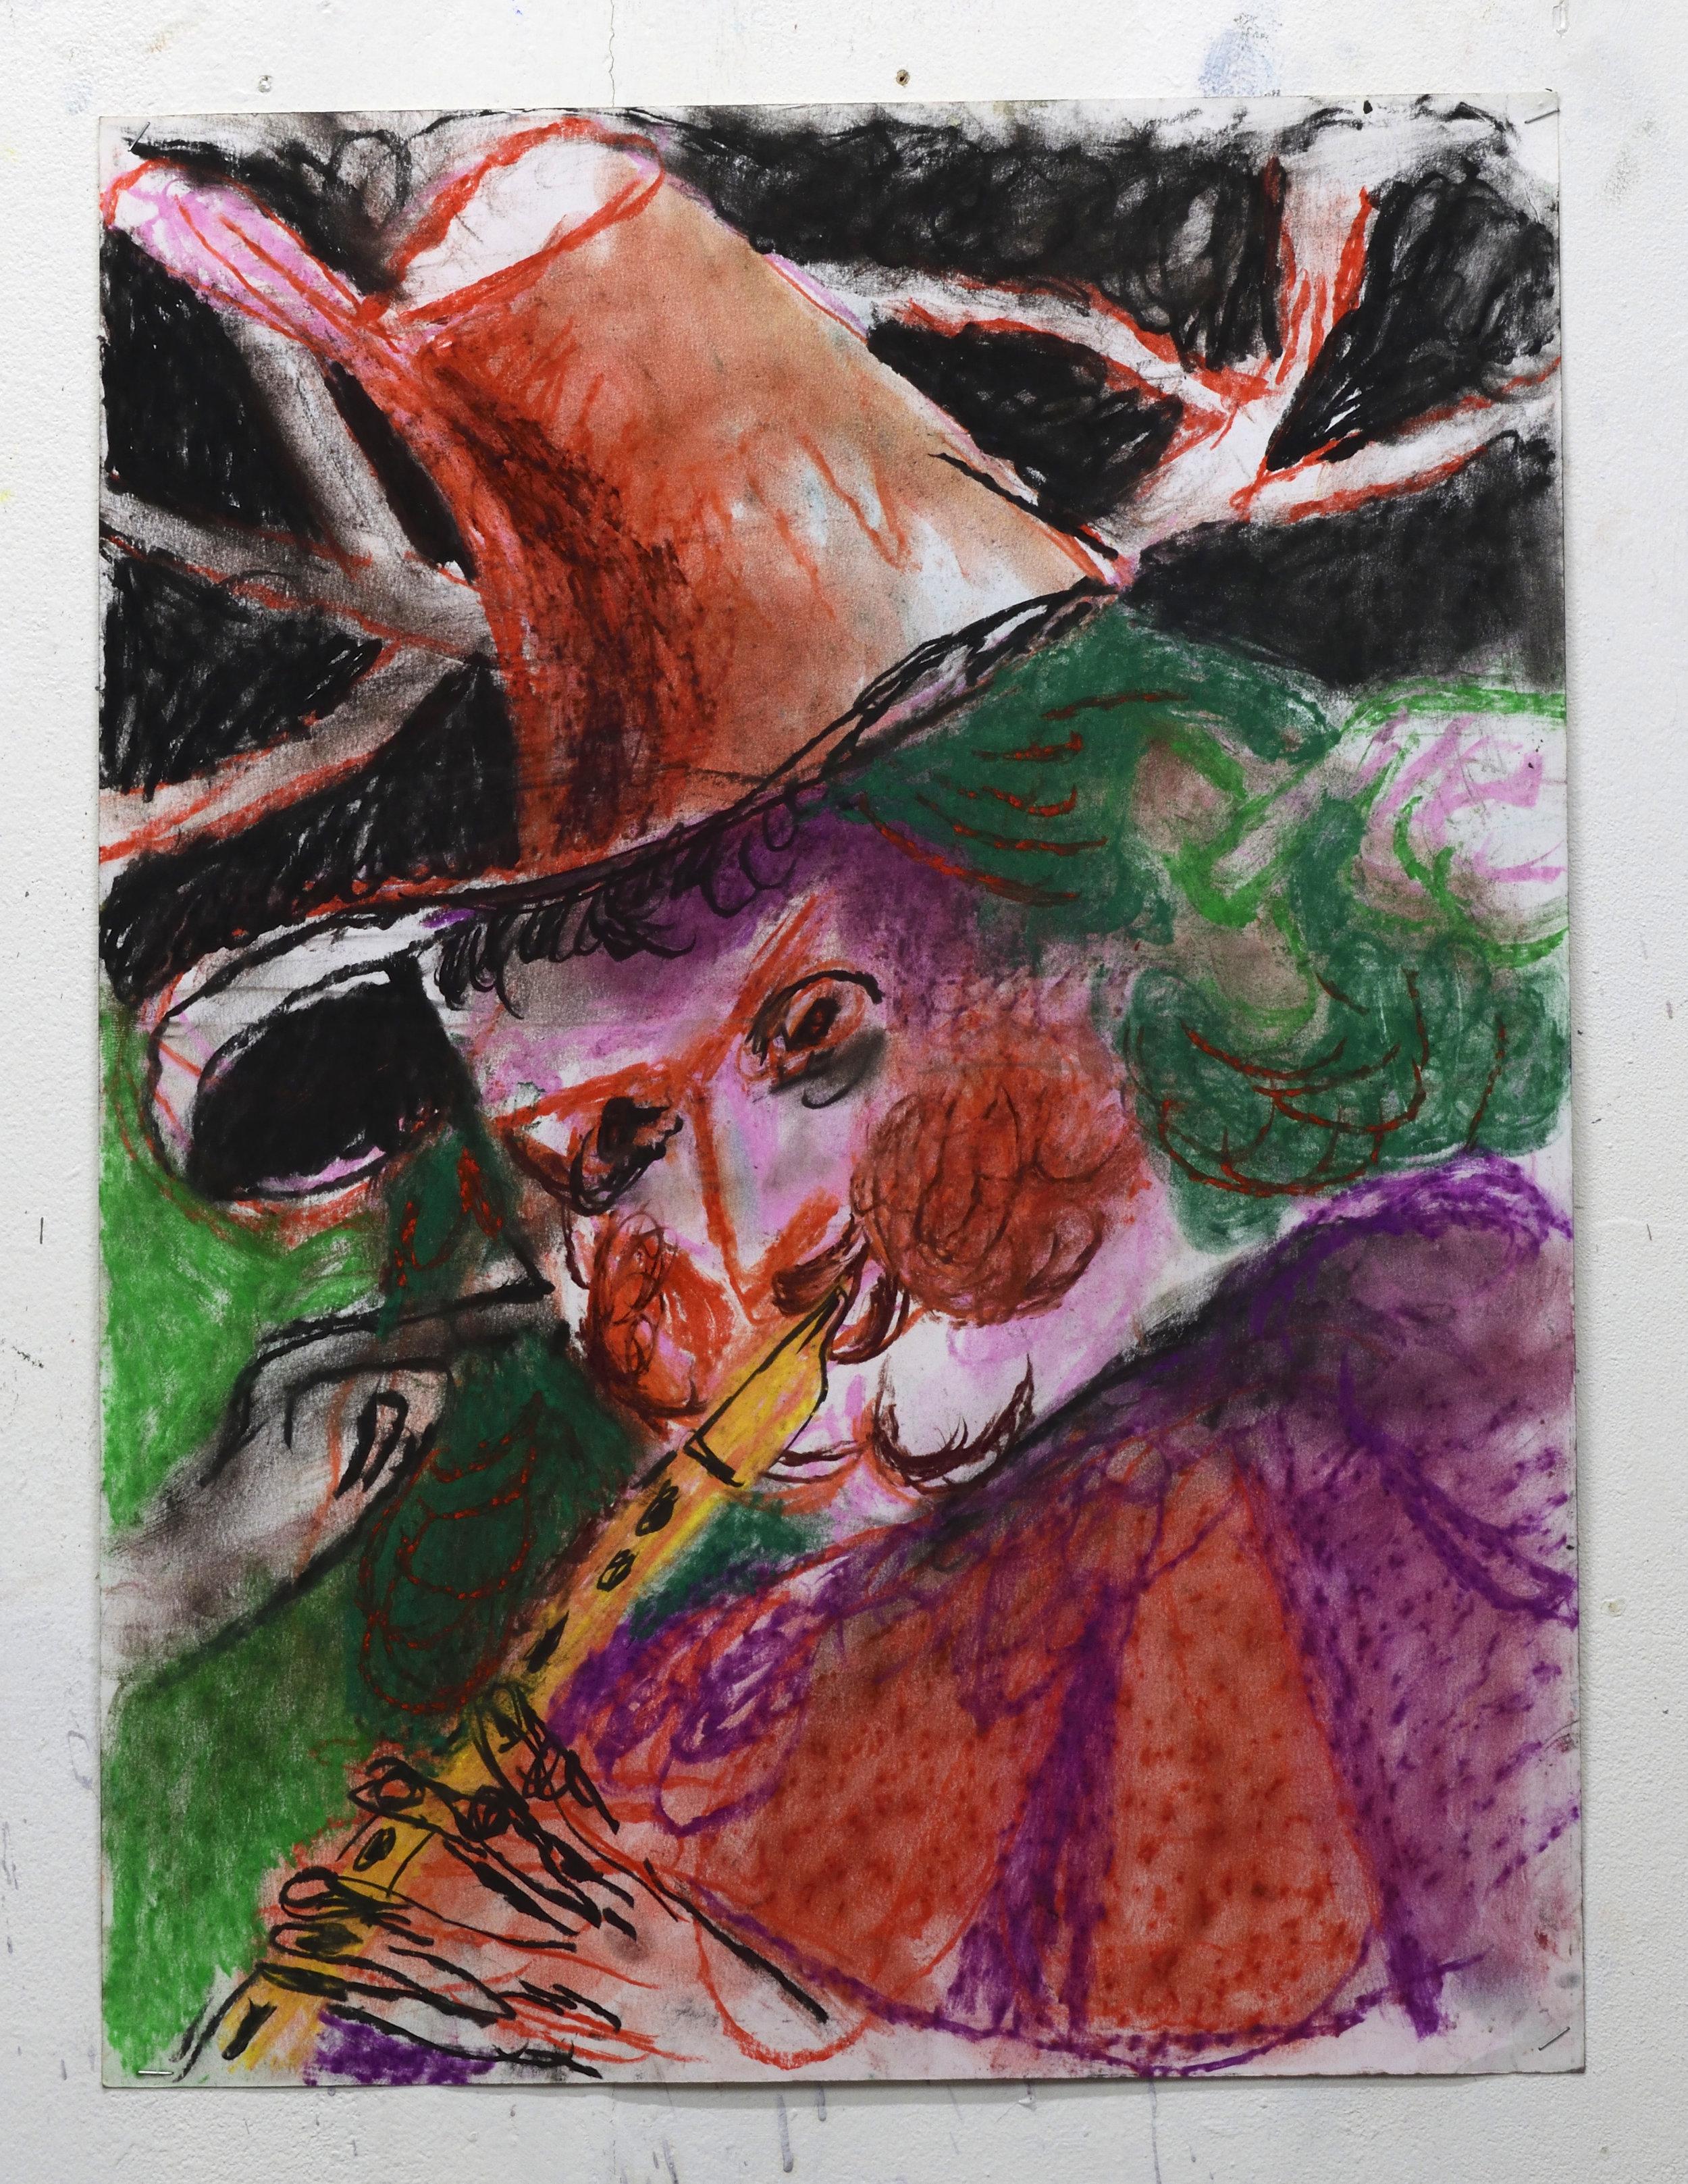 'Deaf Piper' 2018   Pastel on paper. 60.5 x 45 cm